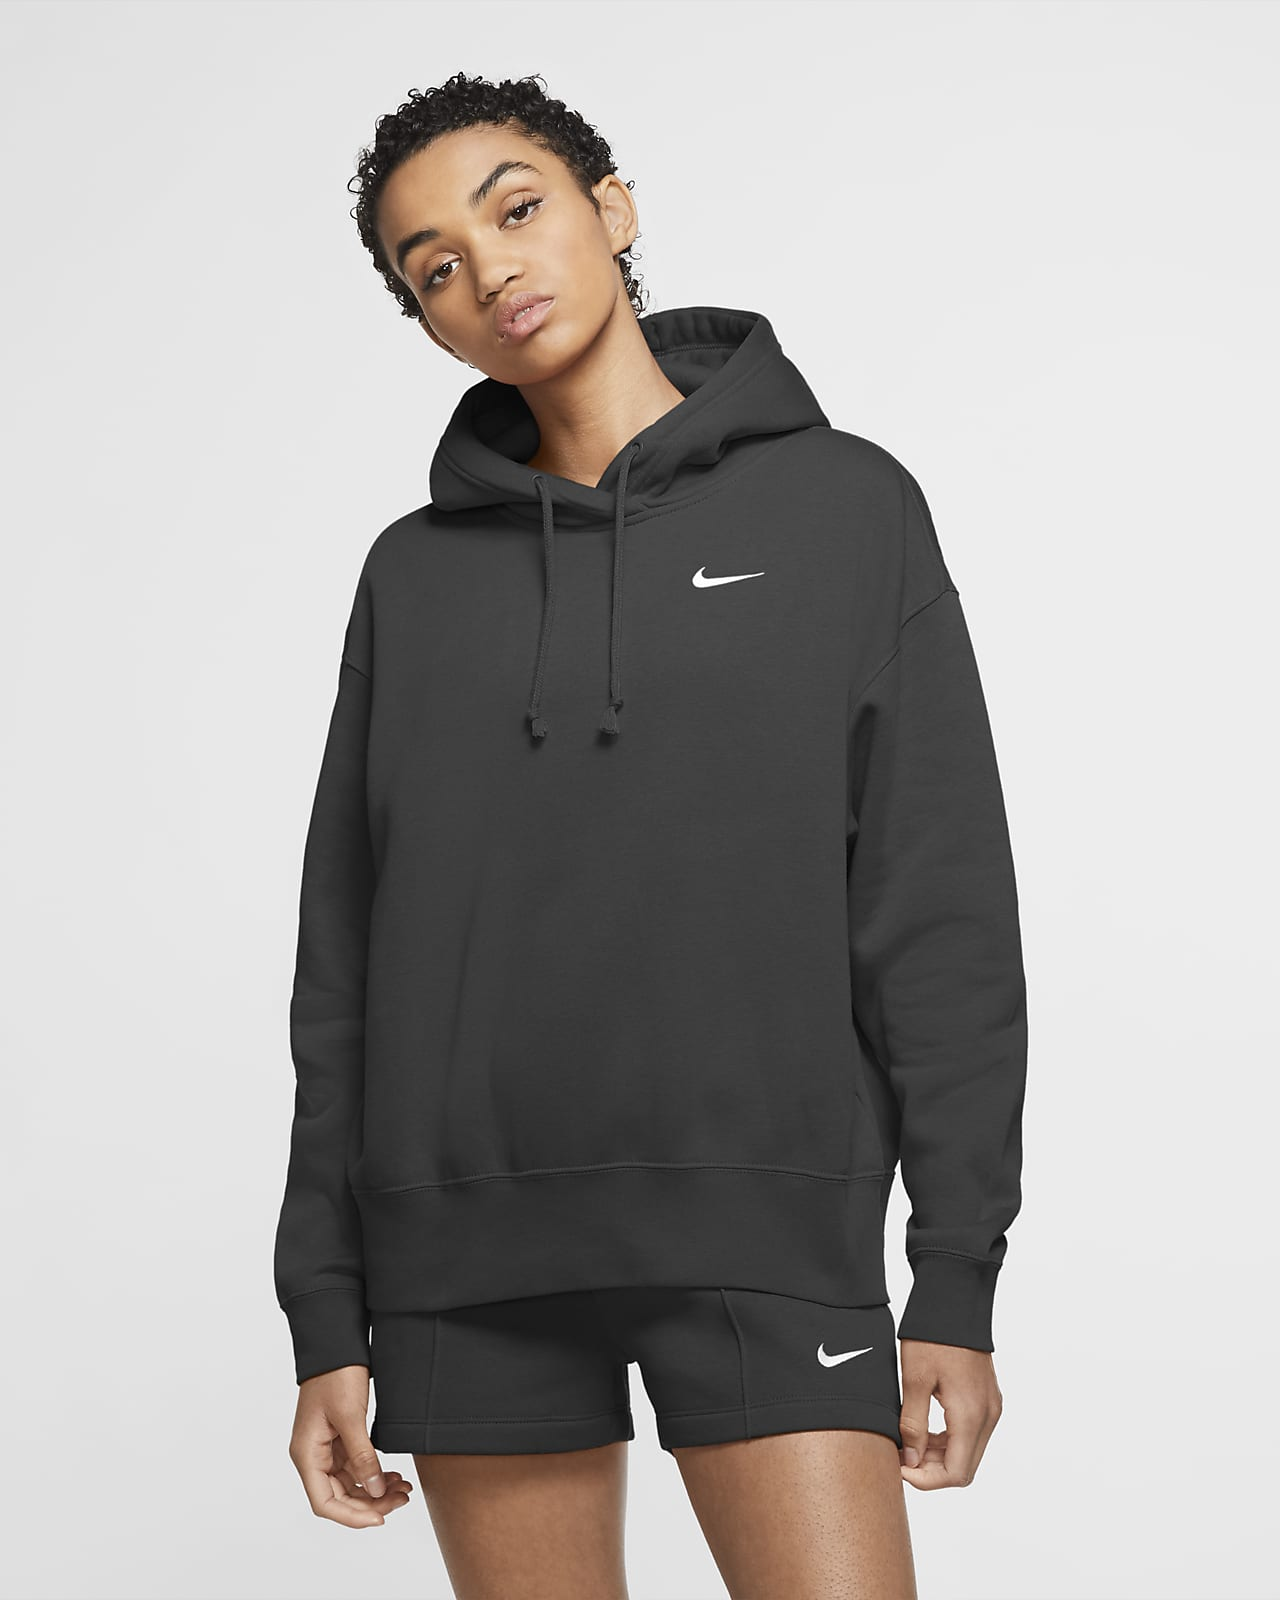 Женская флисовая худи Nike Sportswear